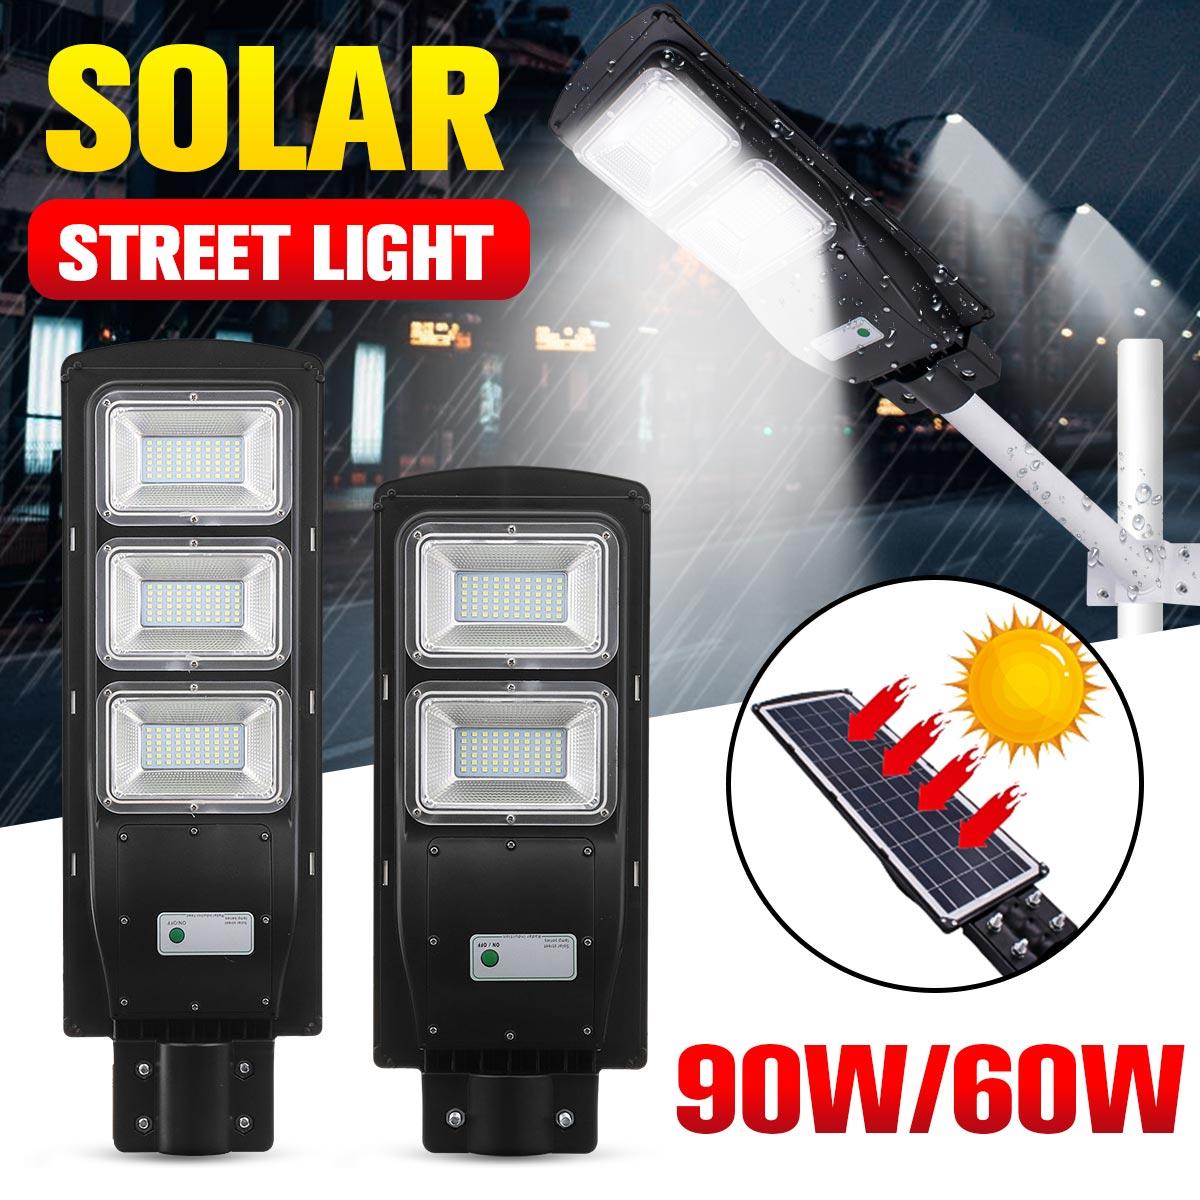 60W 90W LED IP67 Solar Street Light Radar With PIR Motion Sensor Outdoor Lighting Wall Lamps Solar Landscape Garden Lights